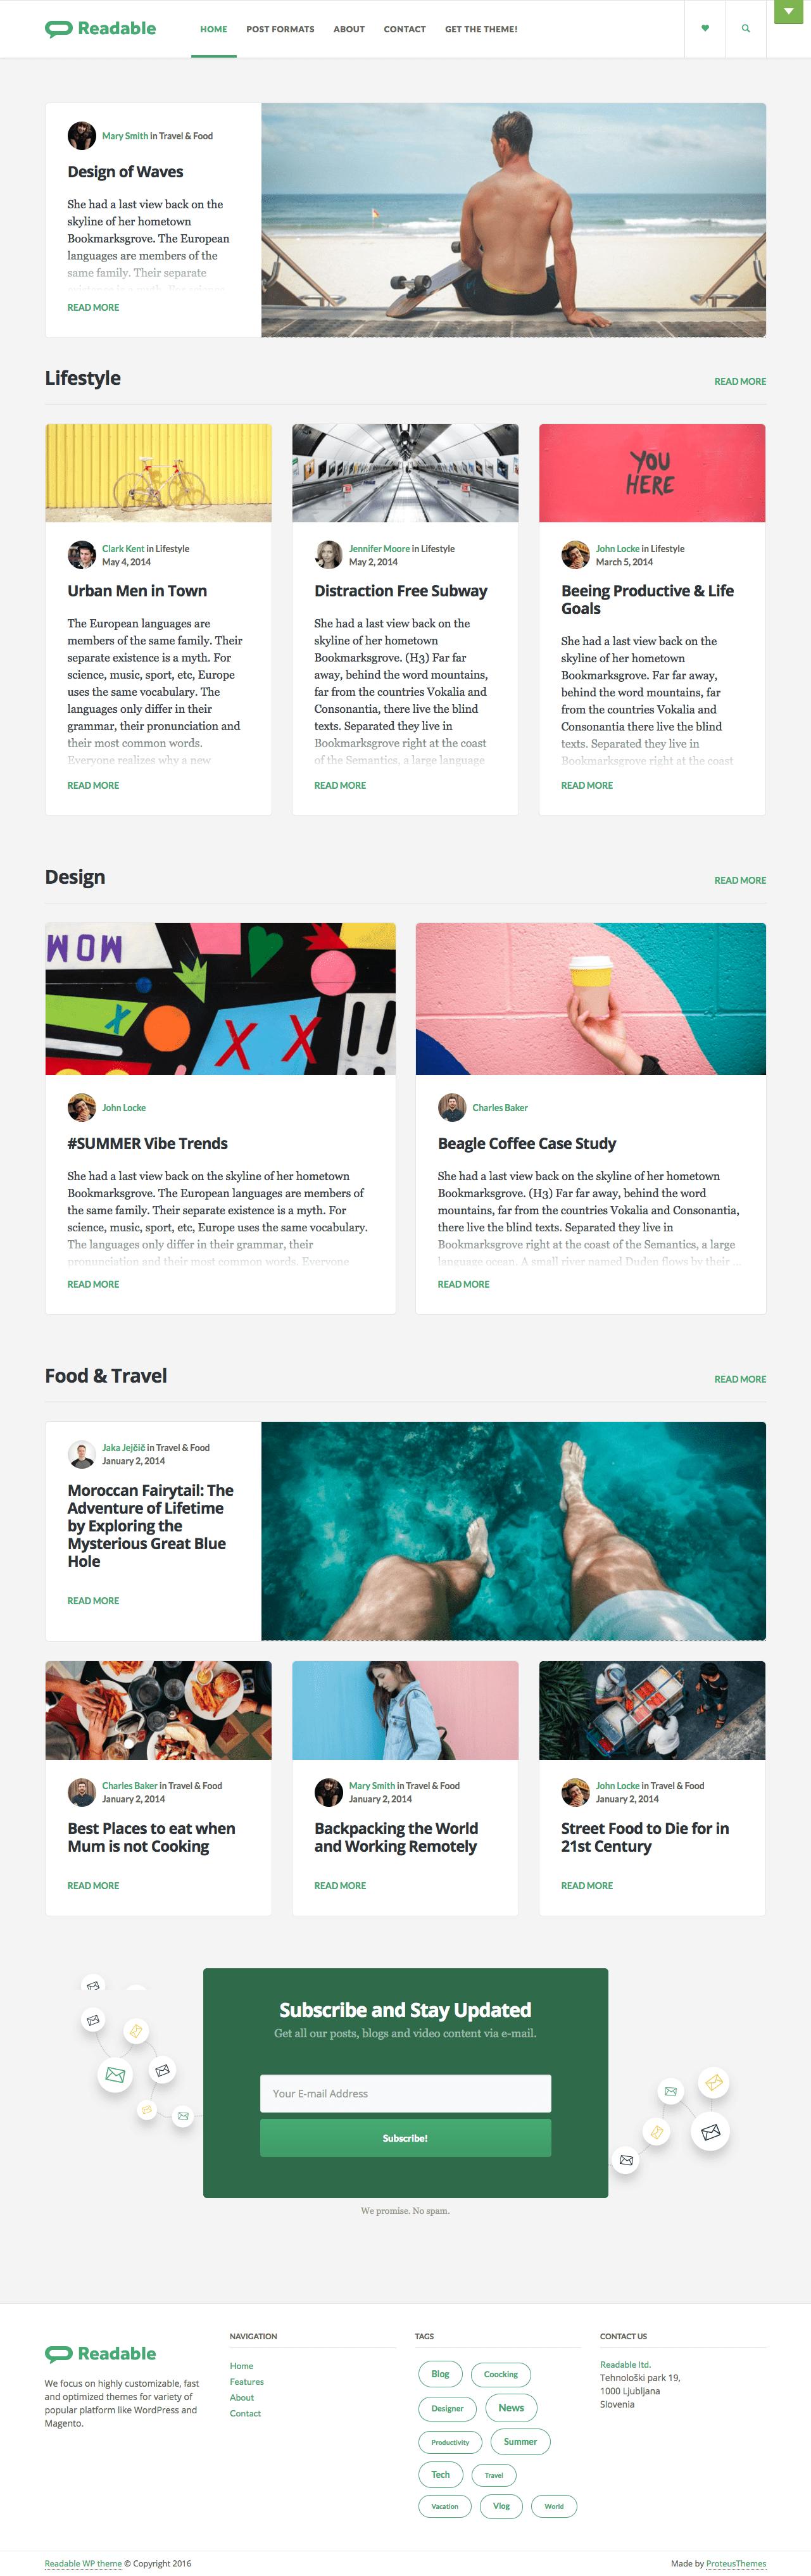 Readable WordPress Blog Theme